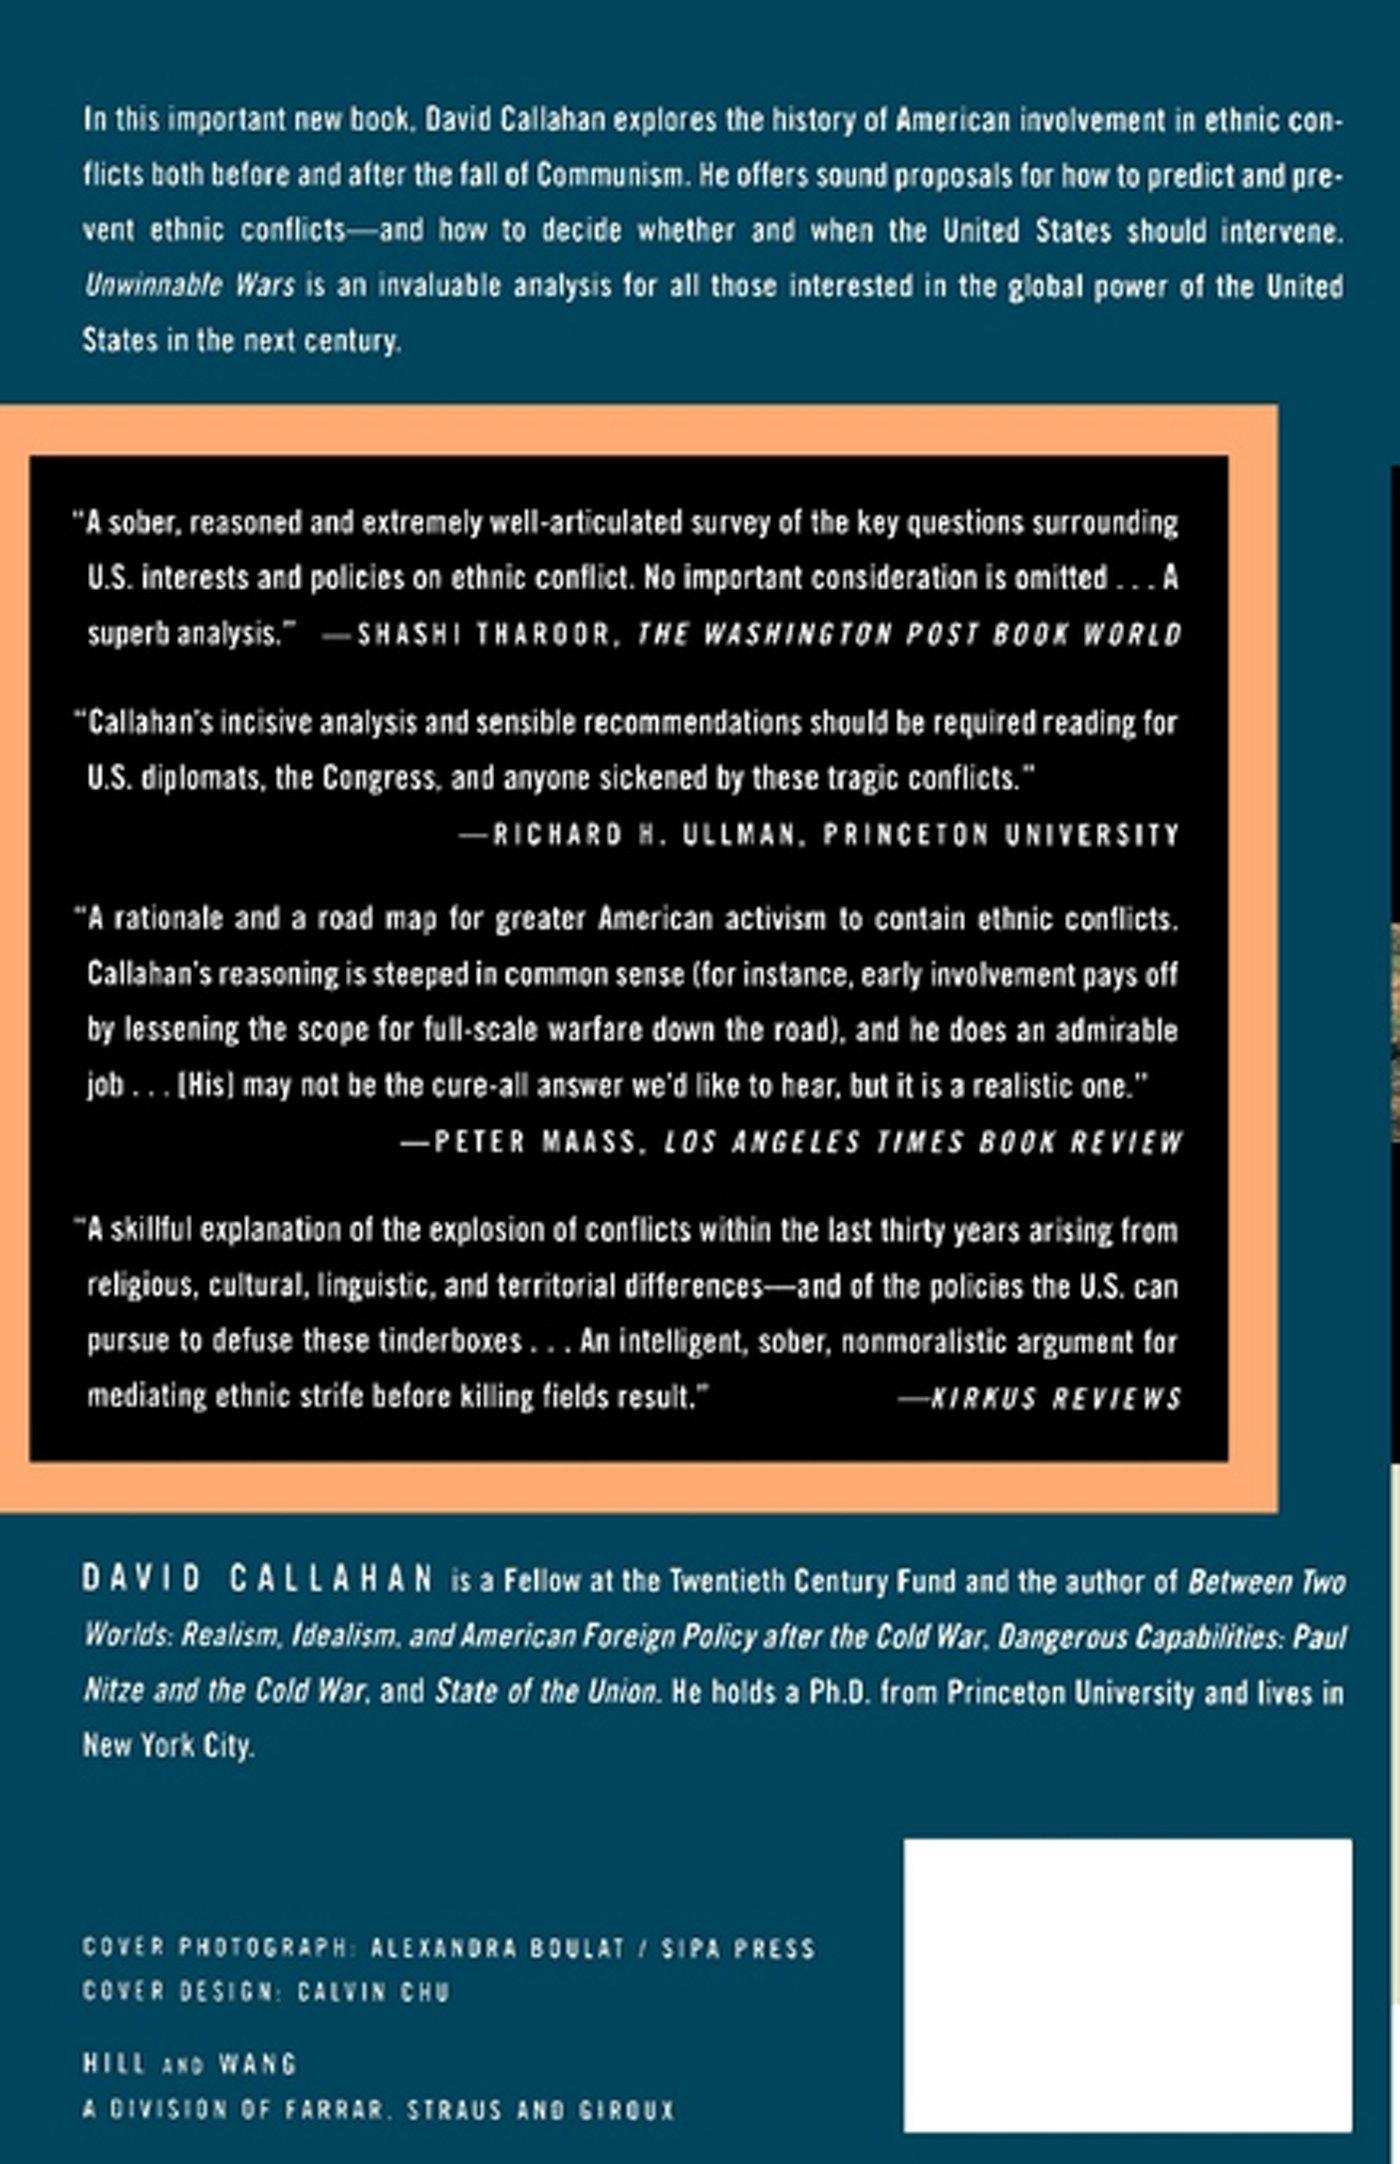 Unwinnable wars american power and ethnic conflict david callahan unwinnable wars american power and ethnic conflict david callahan 9780809016105 amazon books gumiabroncs Gallery